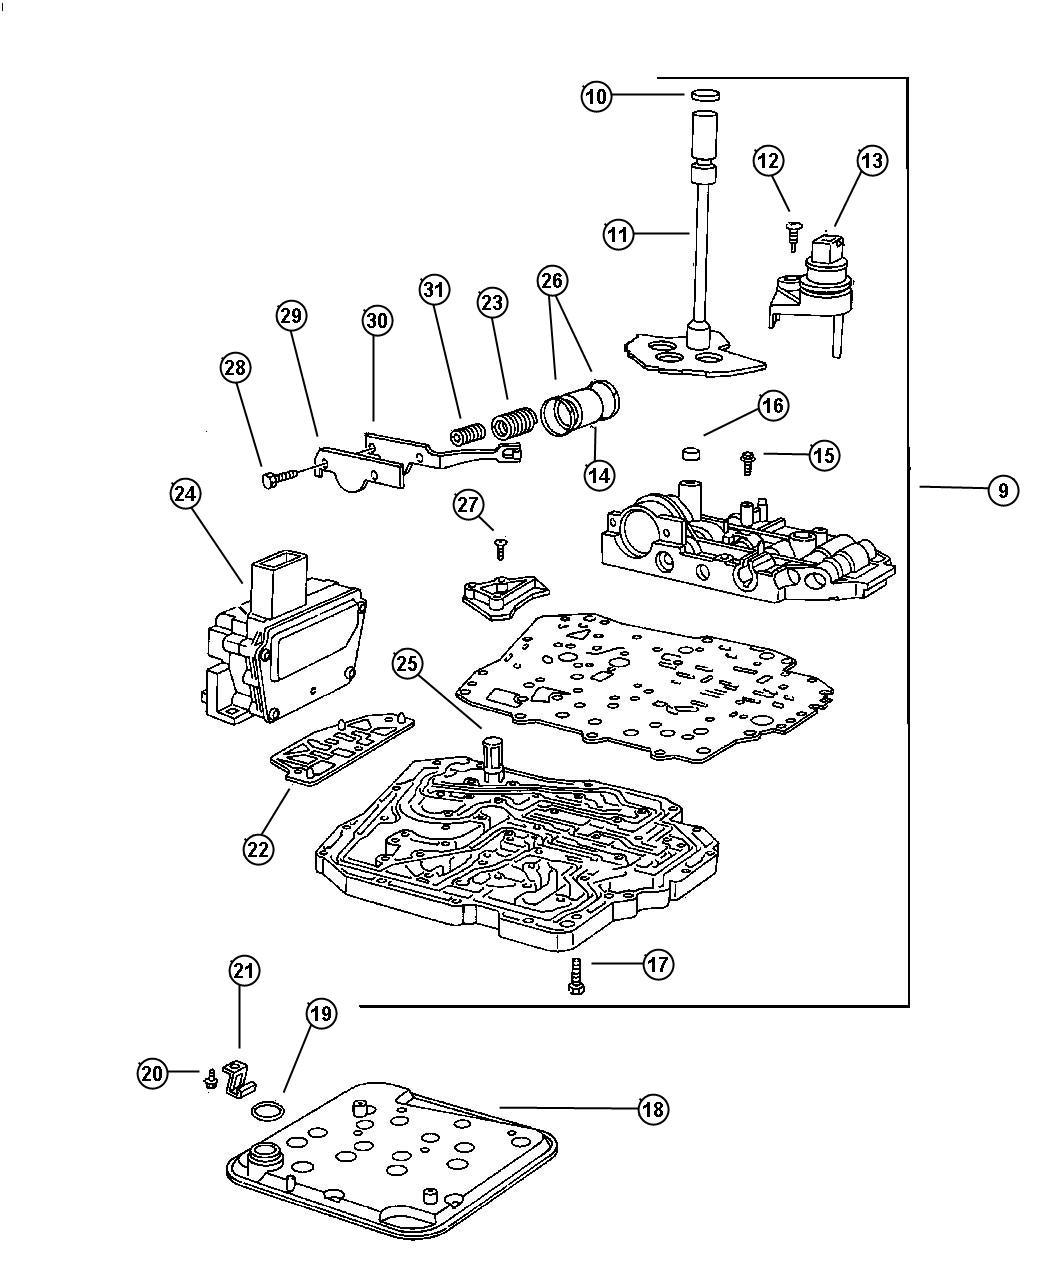 Valve Body Automatic Transaxle, (DGX)